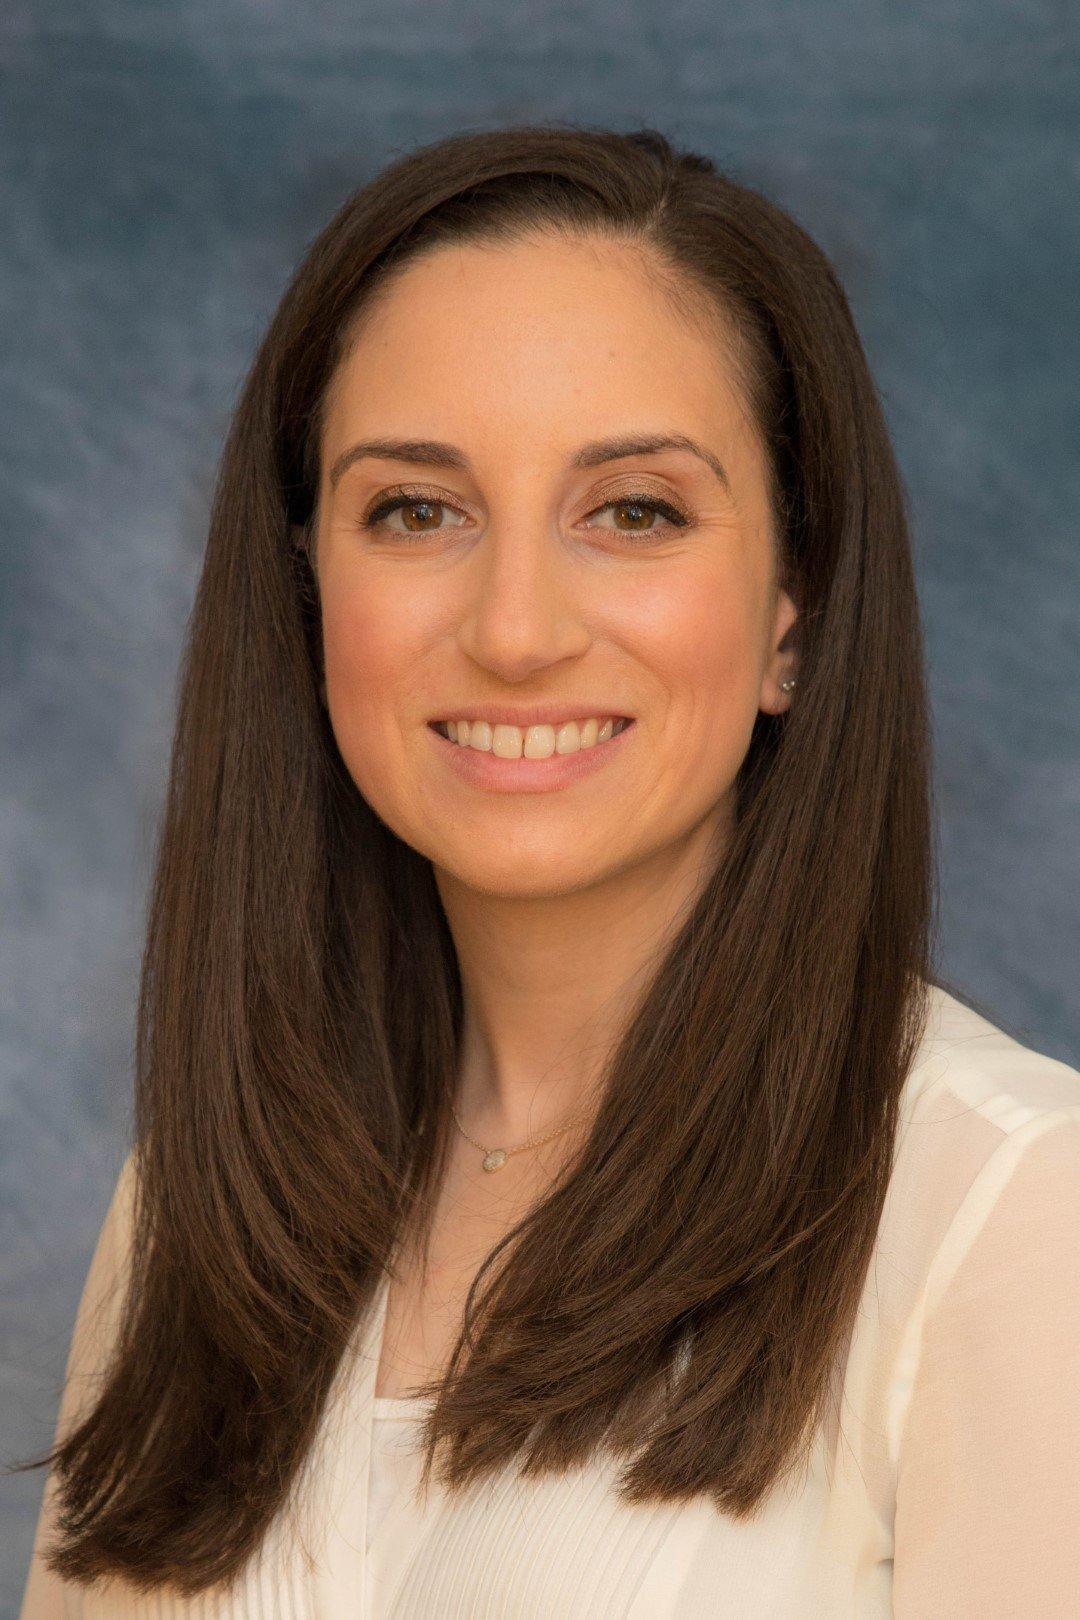 Deena Ghazzi OD Optometrist & Contact Lens Specialist